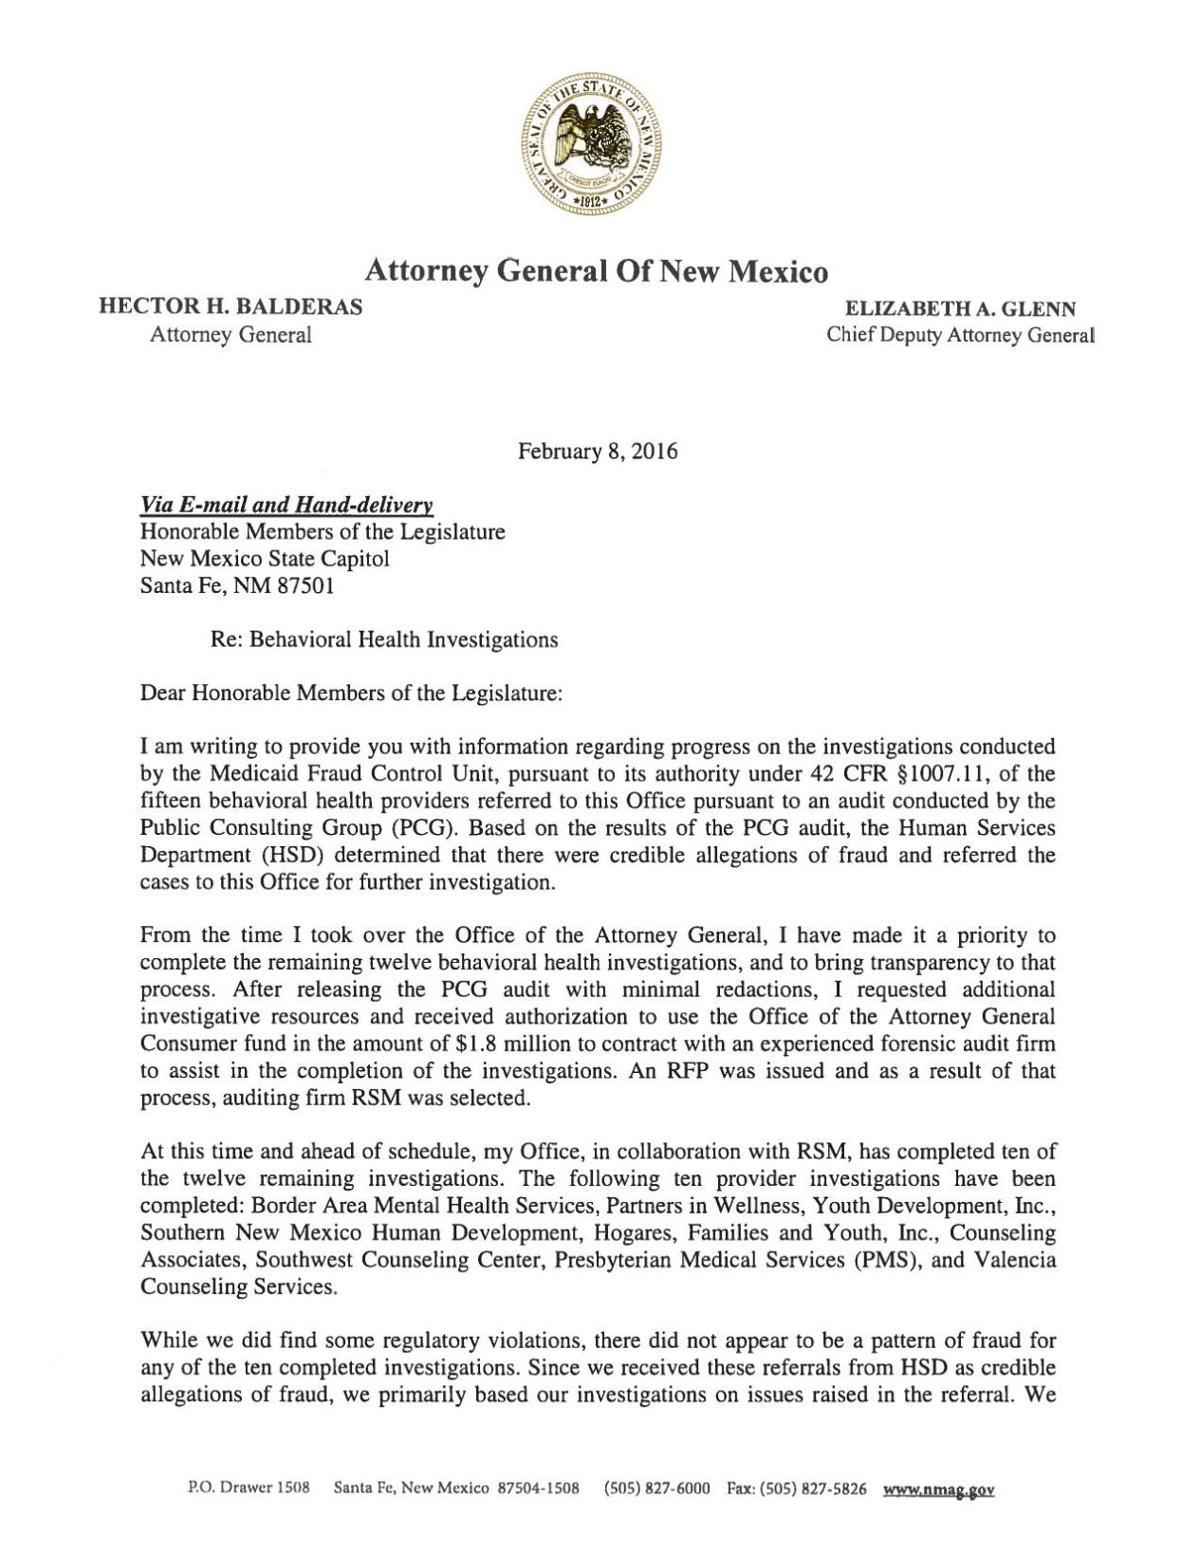 ag letter to legislators regarding behavioral health investigations